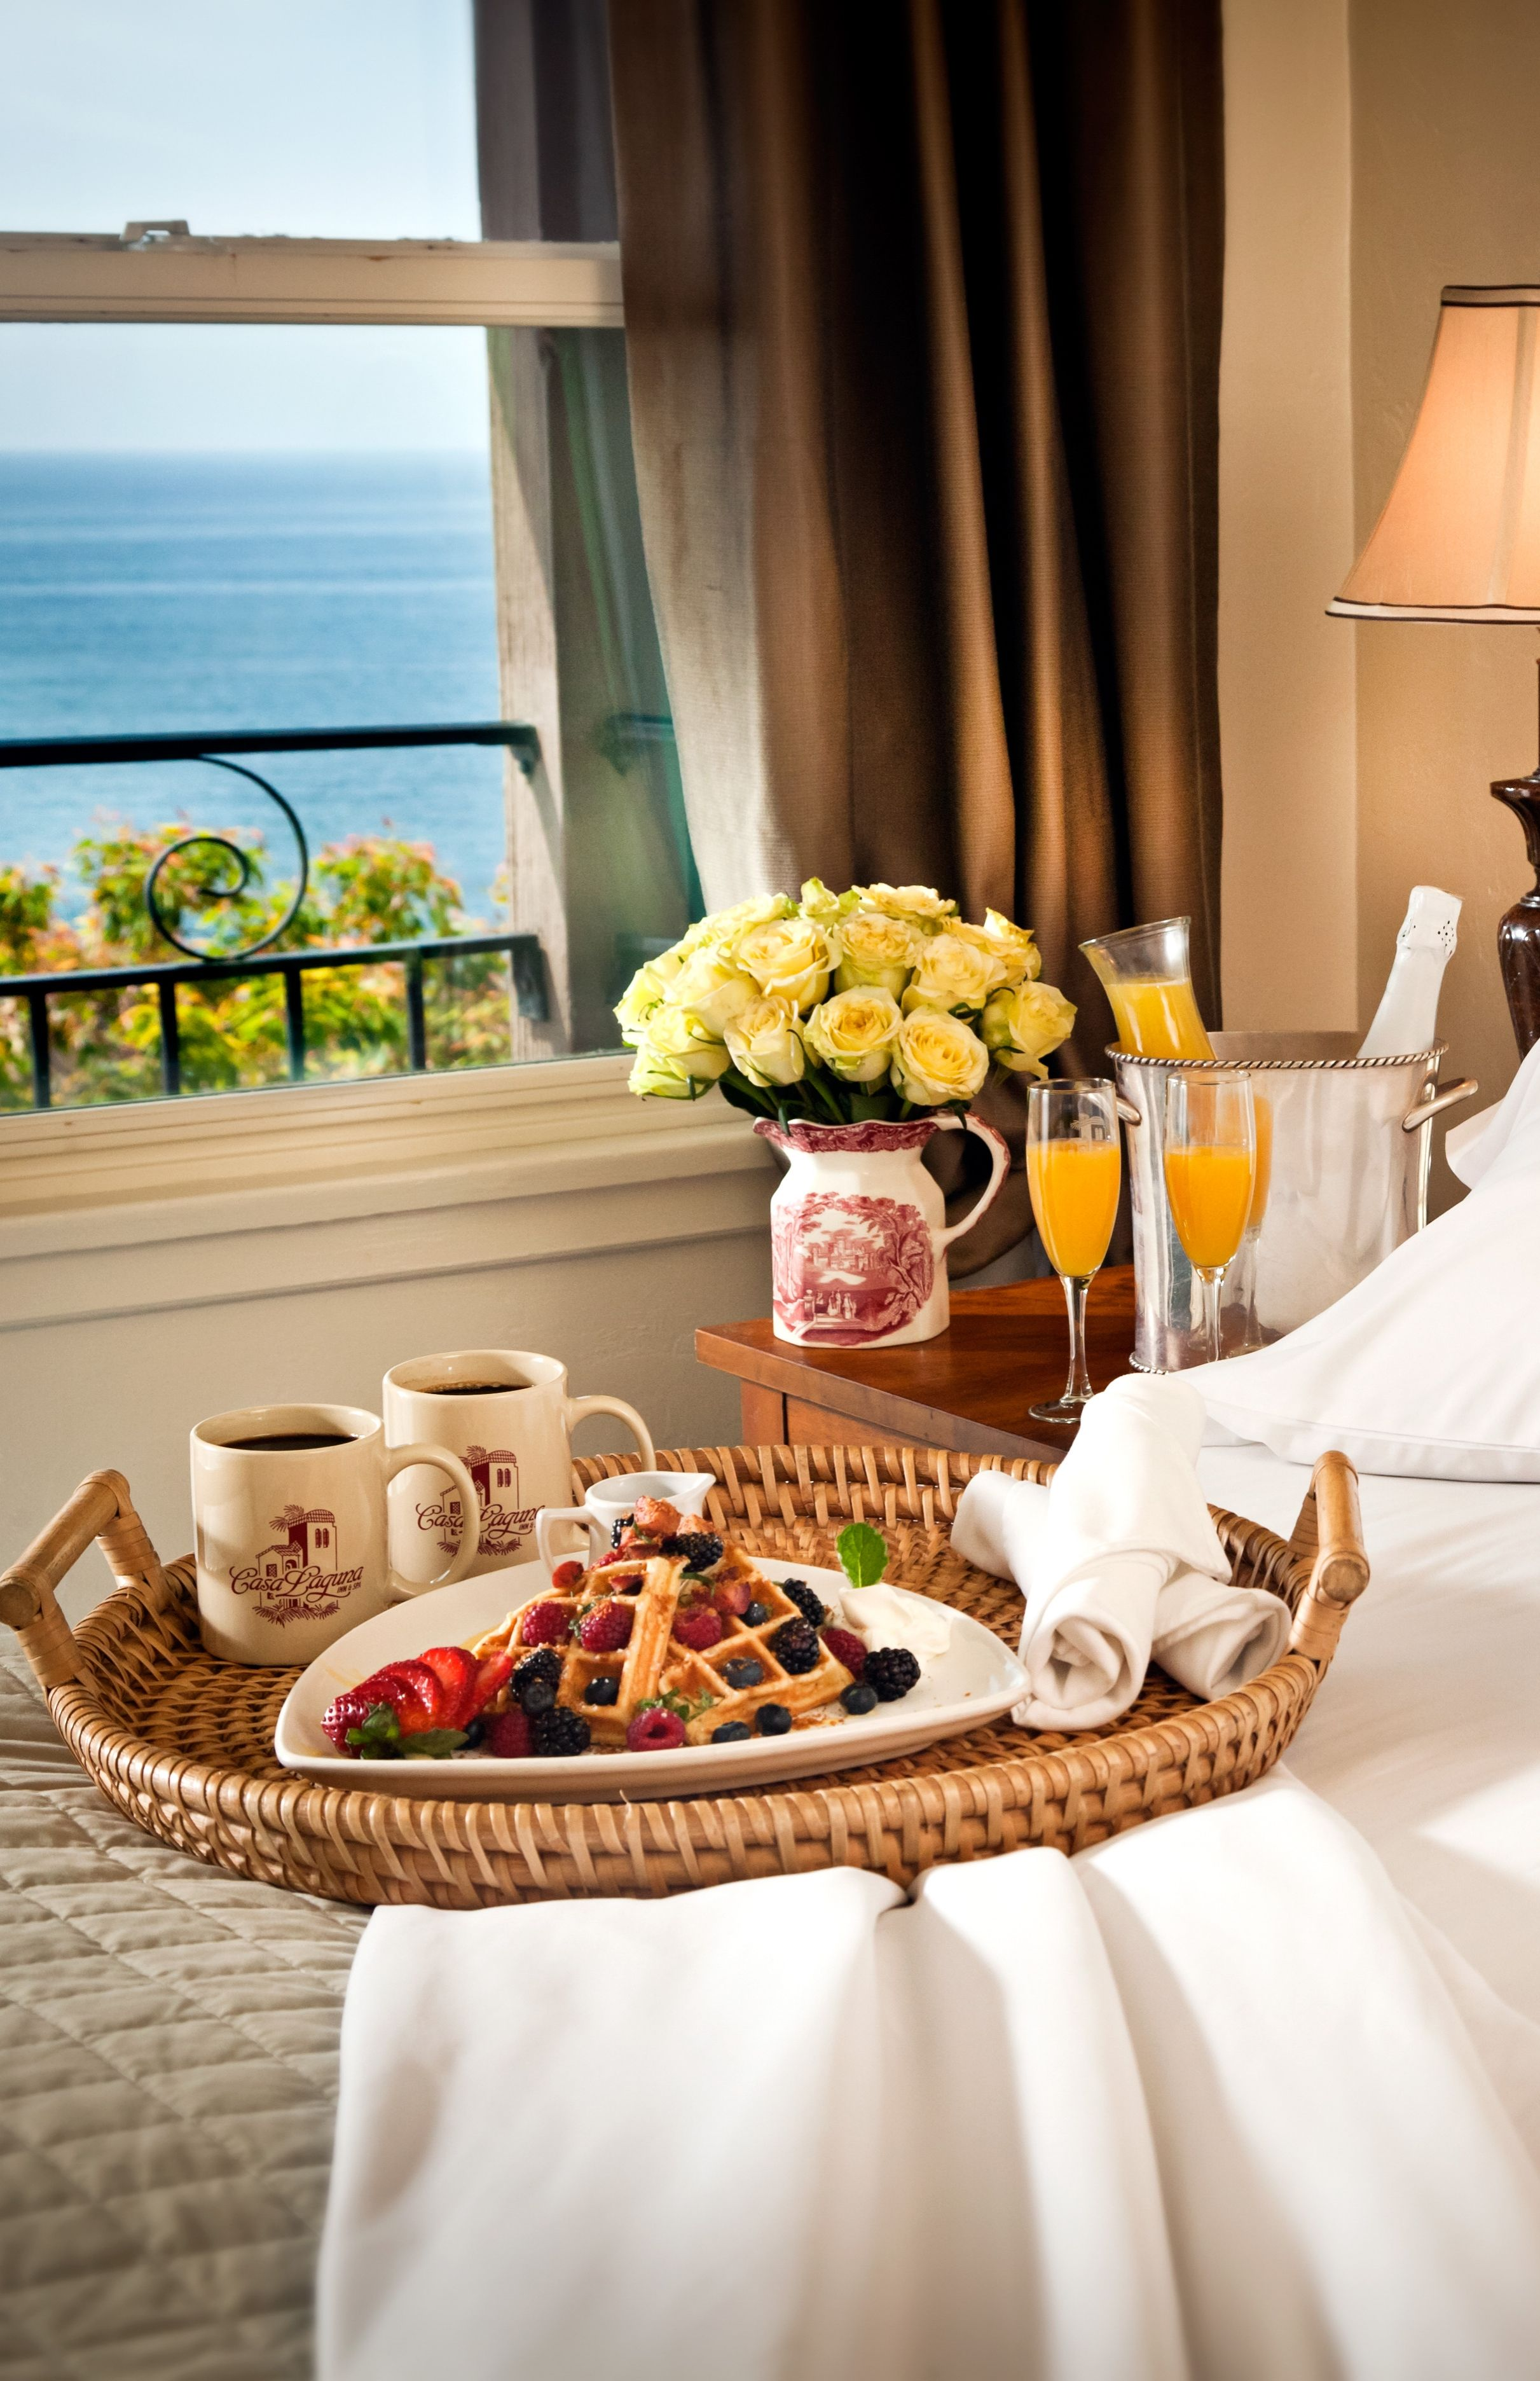 Good Morning Beautiful, Breakfast in bed, anyone? LadyLuxuryDesigns ...